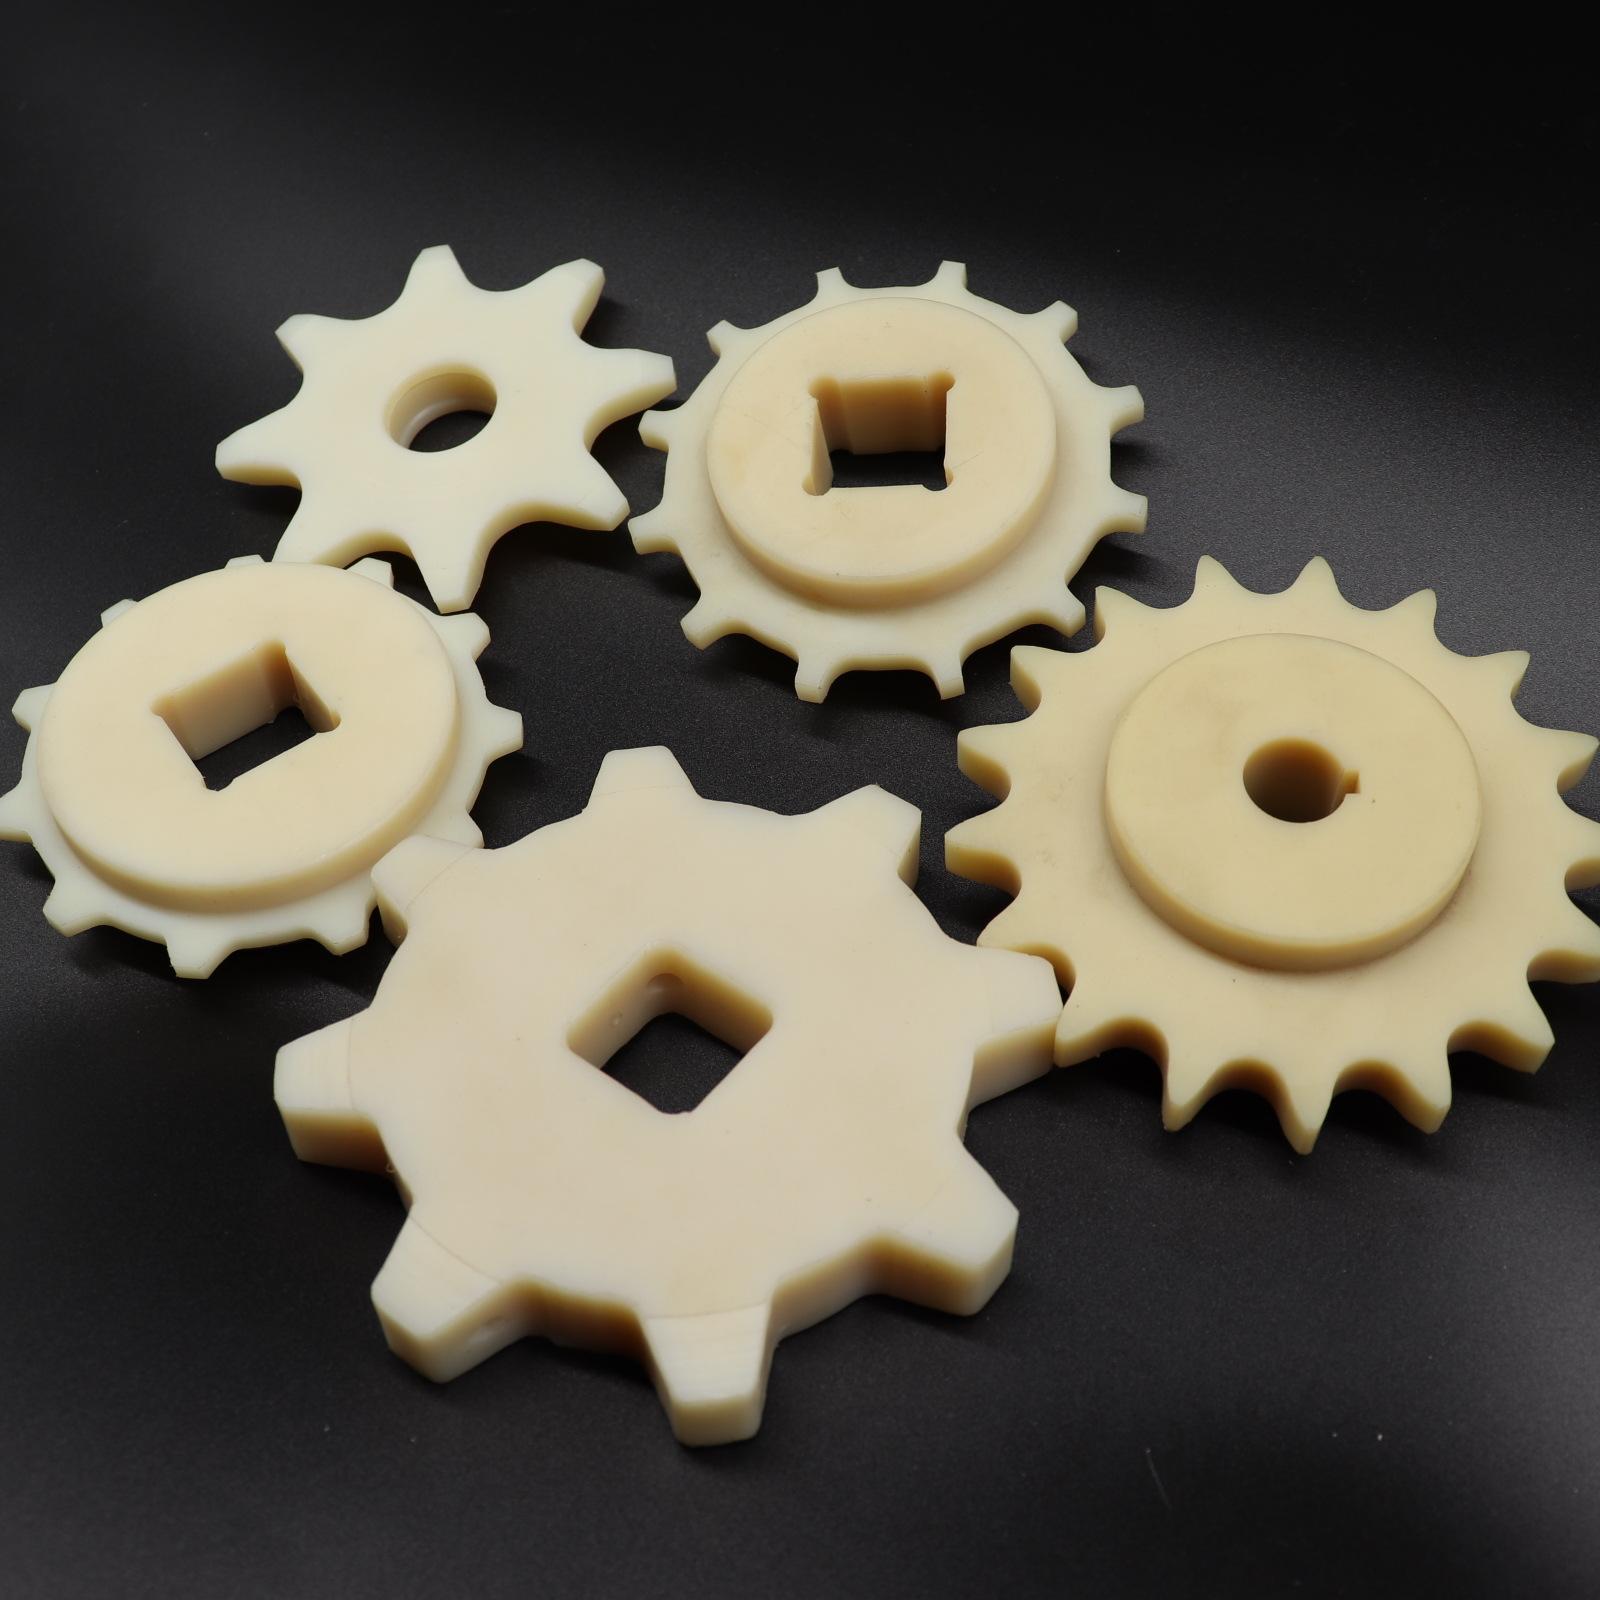 KANGKE Mechanical equipment nylon cylindrical gears, plastic transmission gears, wear-resistant redu